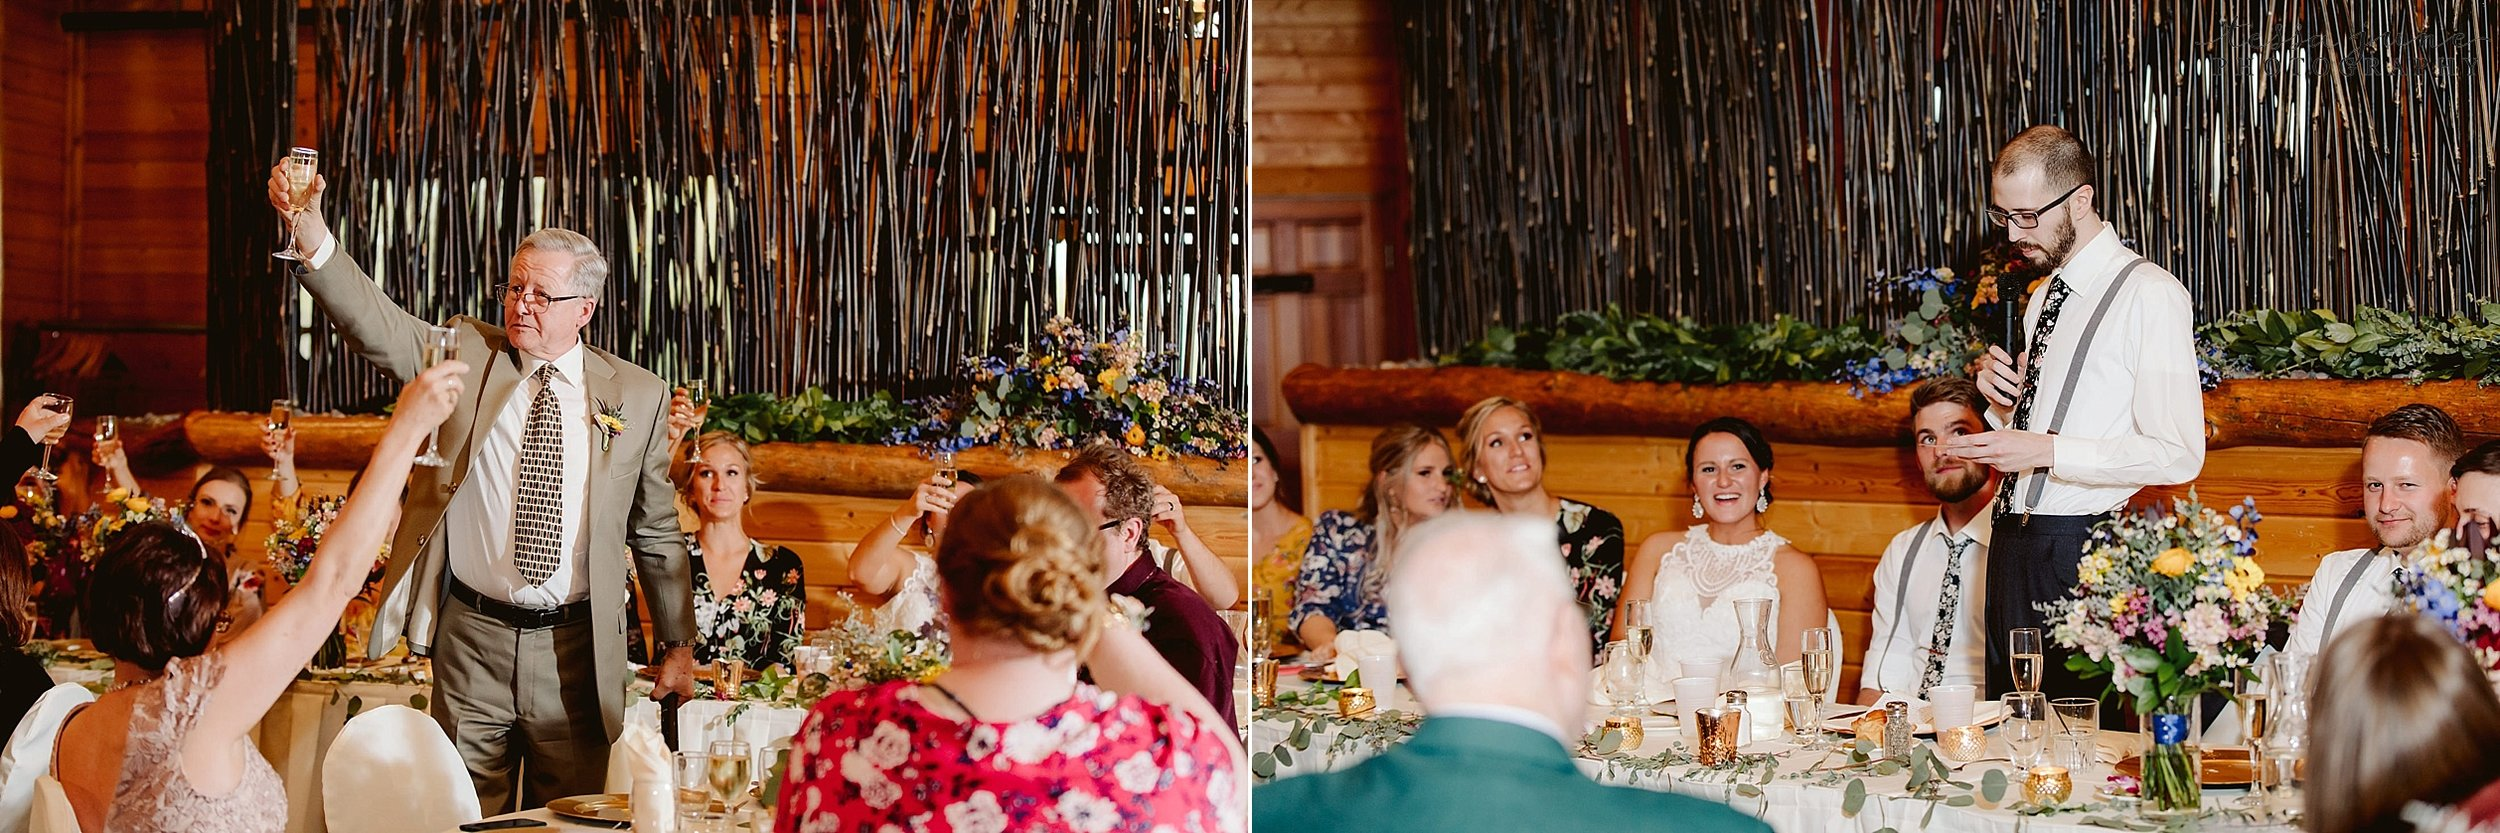 The-grands-at-mulligans-wedding-sartell-minnesota-spring-floral-spring-garden-wedding-141.jpg